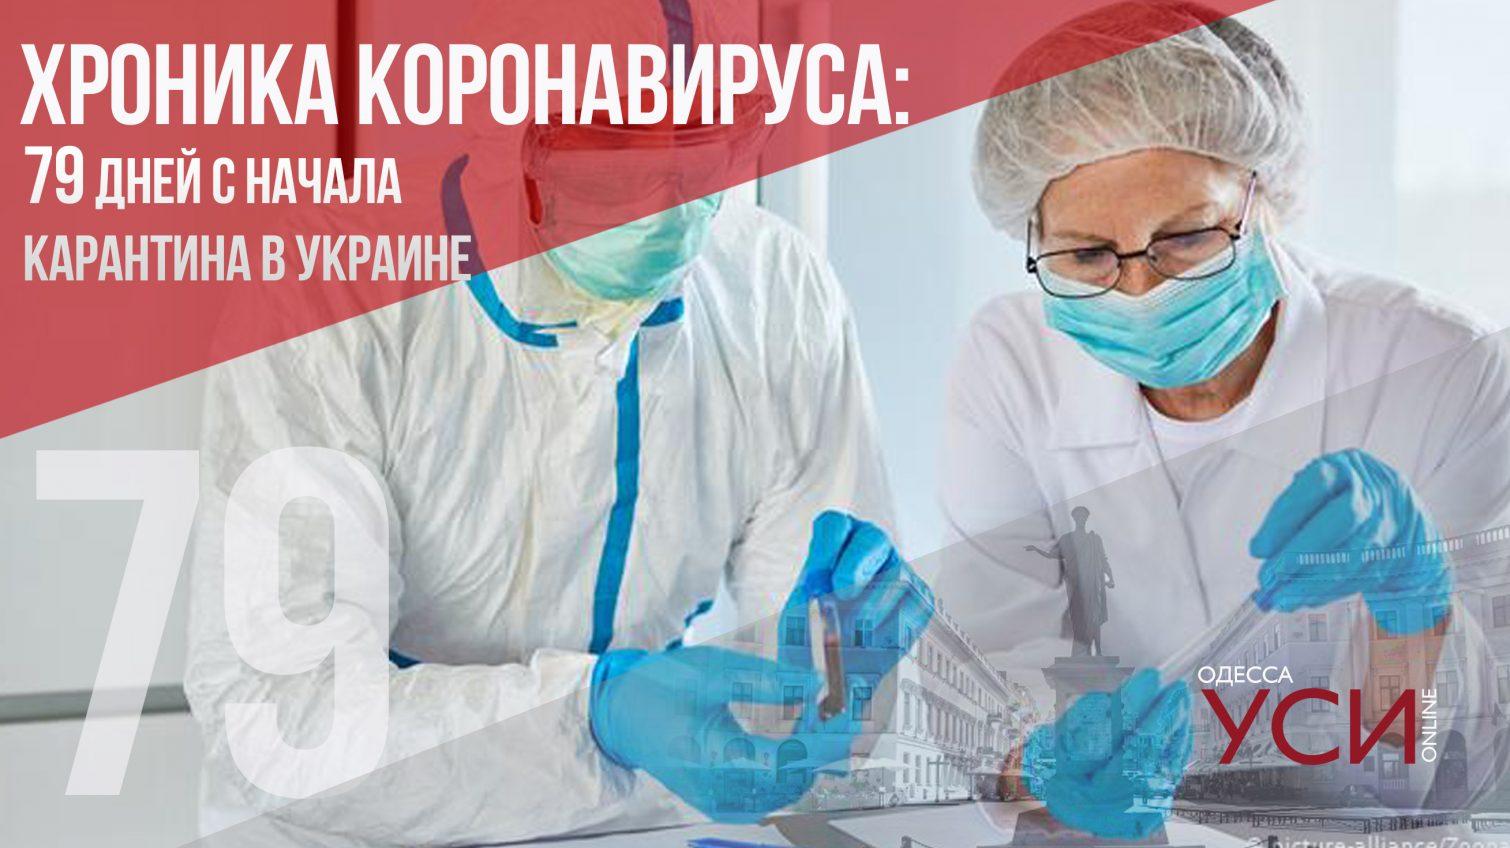 Хроника коронавируса: 79 дней с начала карантина в Украине ОБНОВЛЯЕТСЯ «фото»